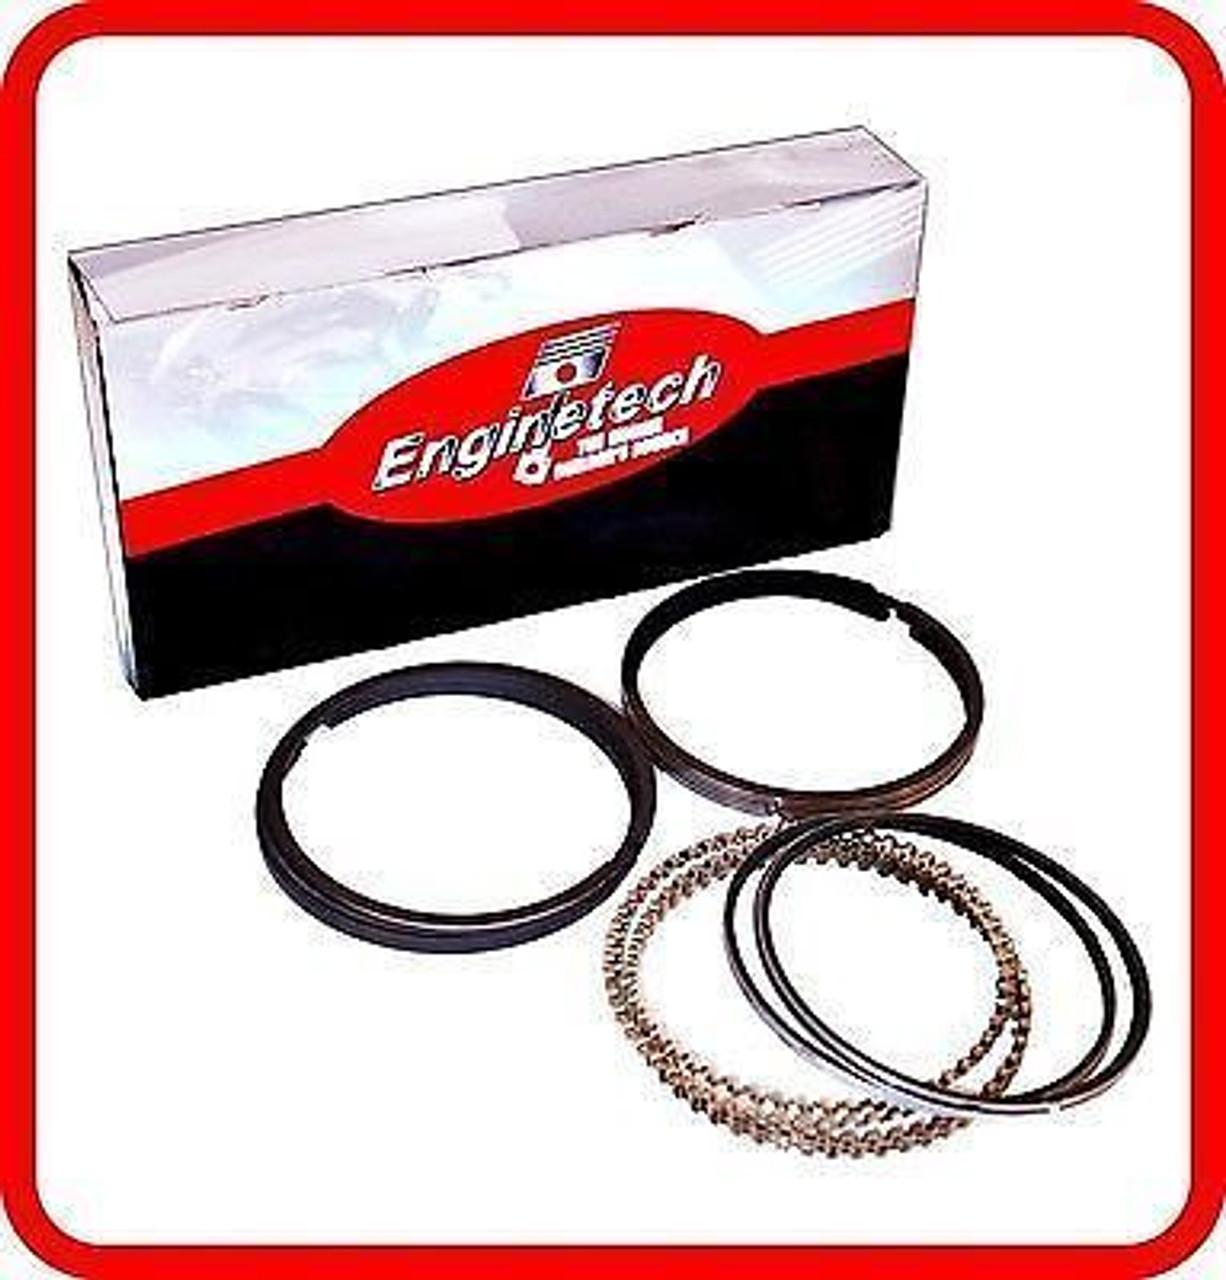 Enginetech C39158-030 Engine Piston Ring Set